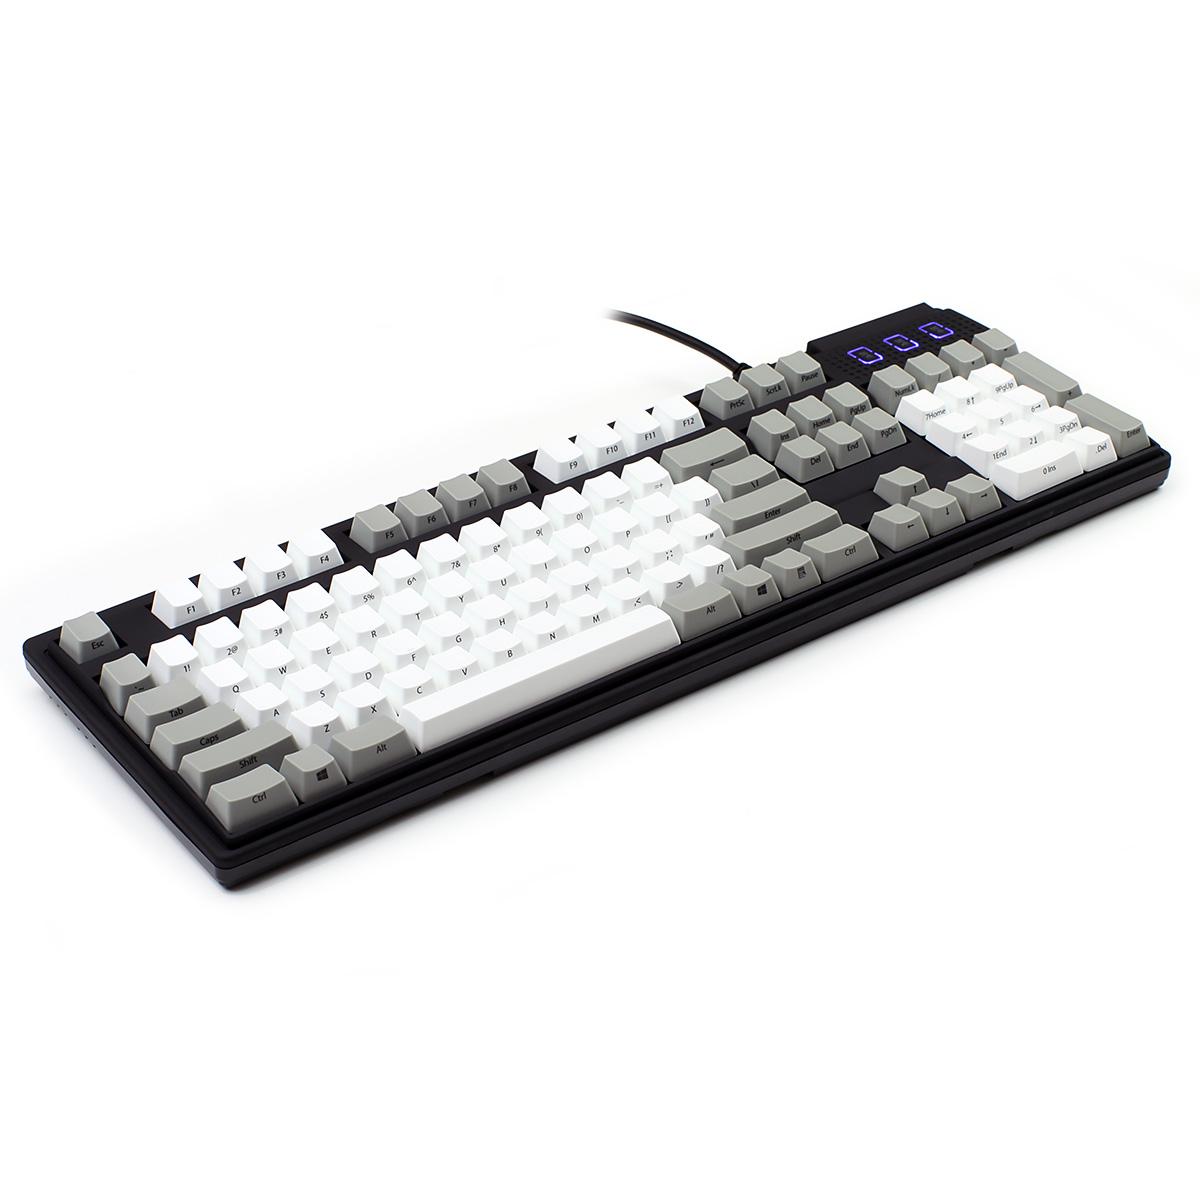 21e4aee0a88 ... AN EXAMPLE: Max Keyboard Nighthawk Custom Color Entry Level Mechanical  Keyboard